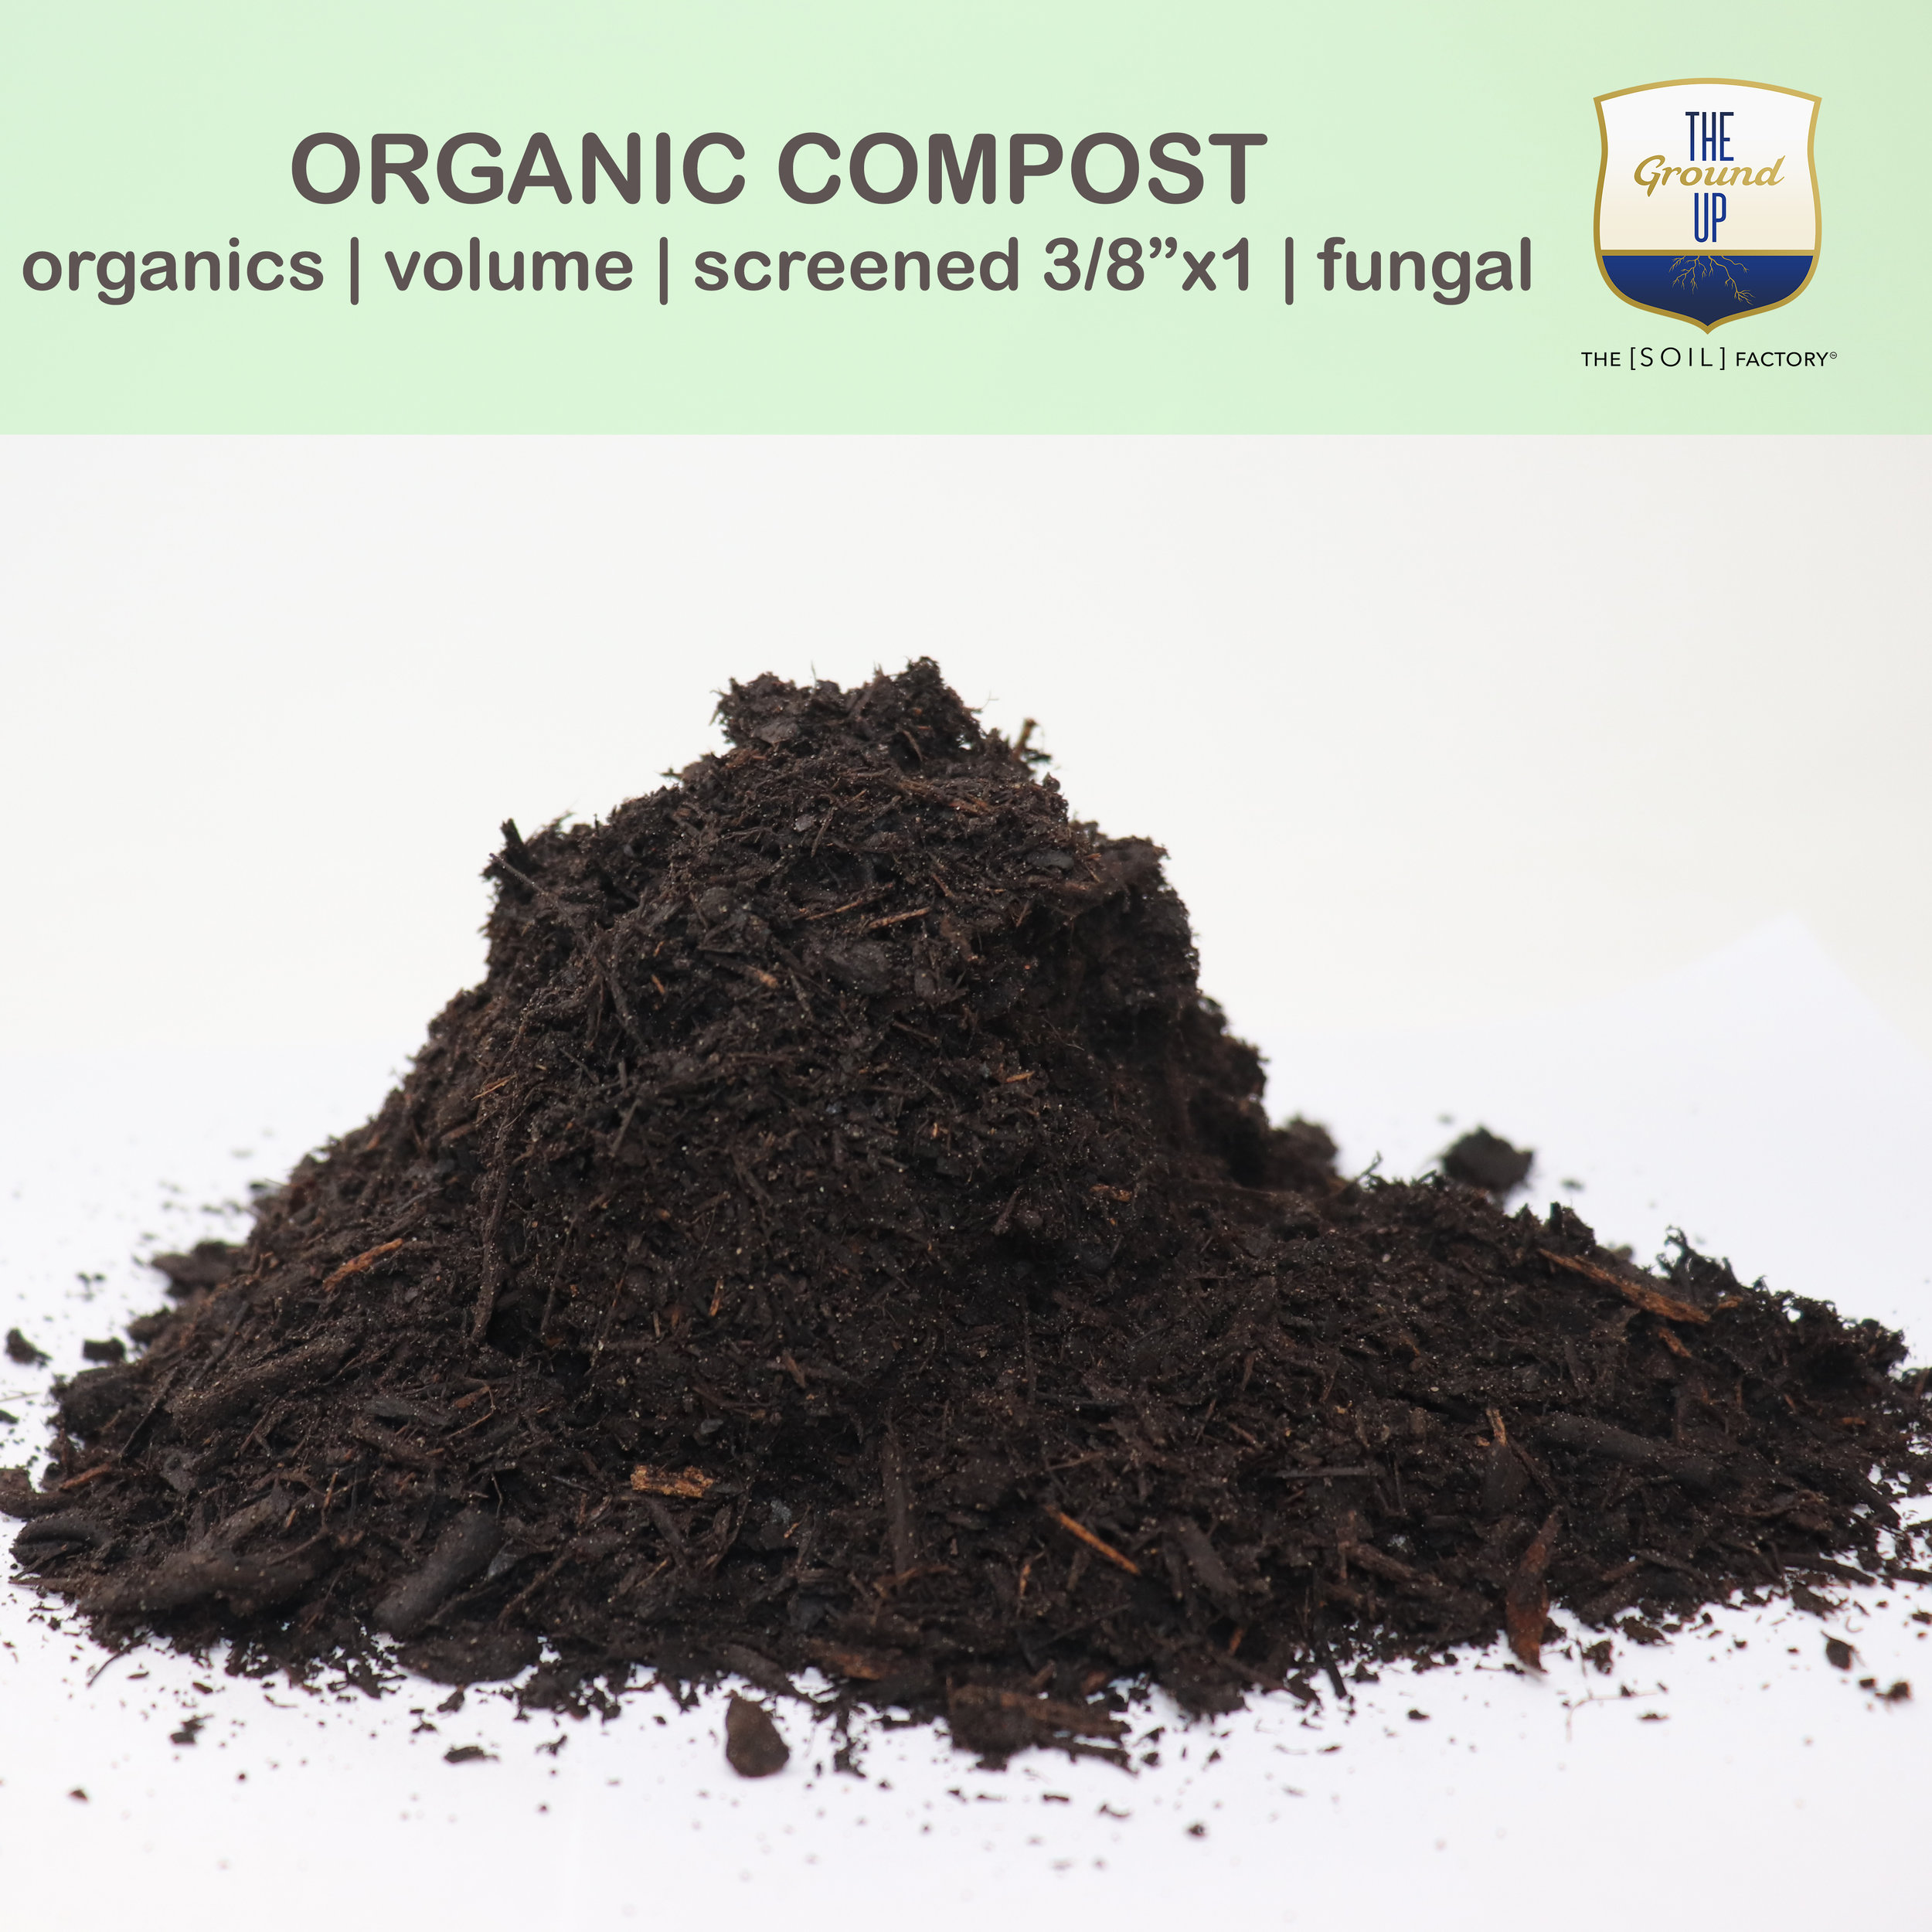 OrganicCompost.jpg